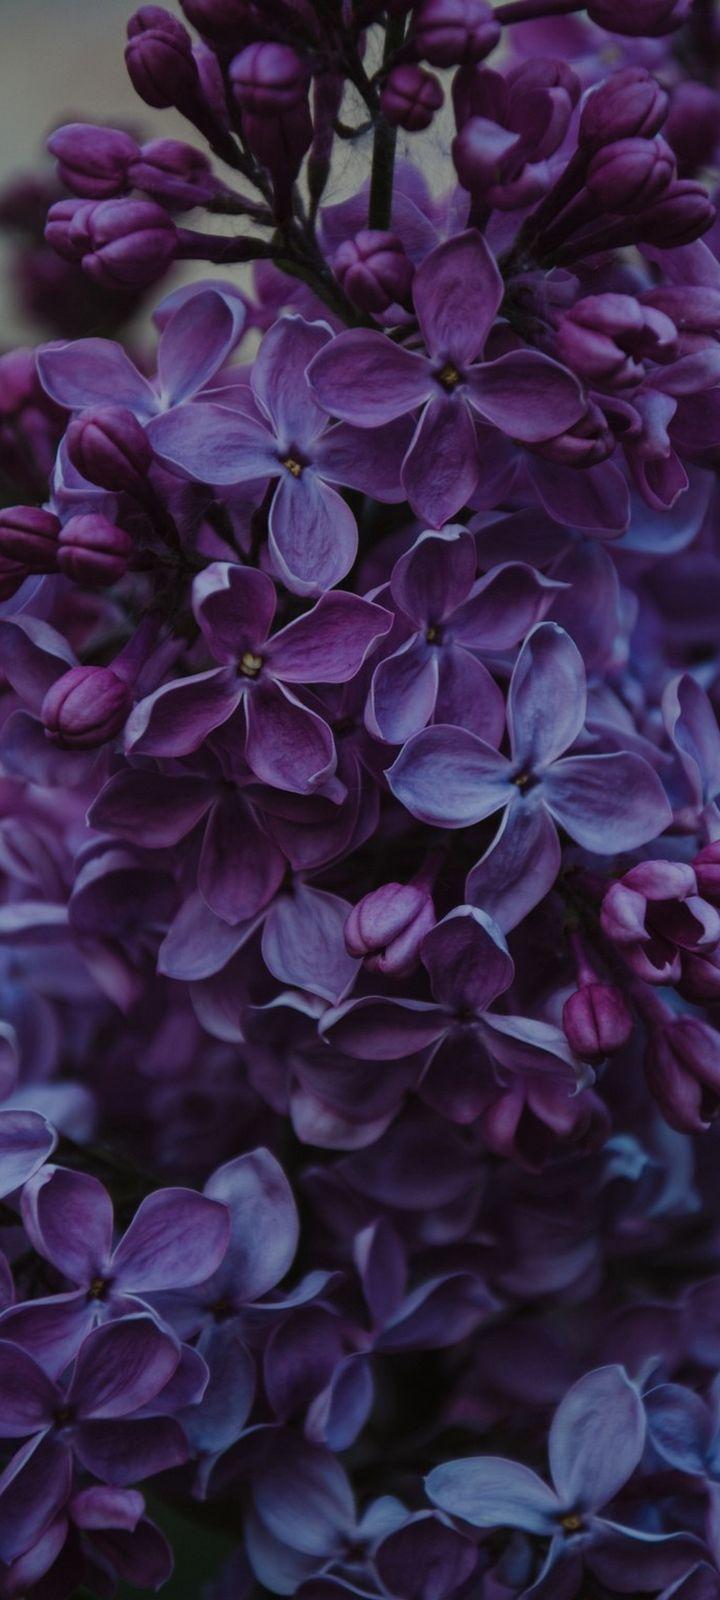 Lilac Inflorescences Flowers Wallpaper 720x1600